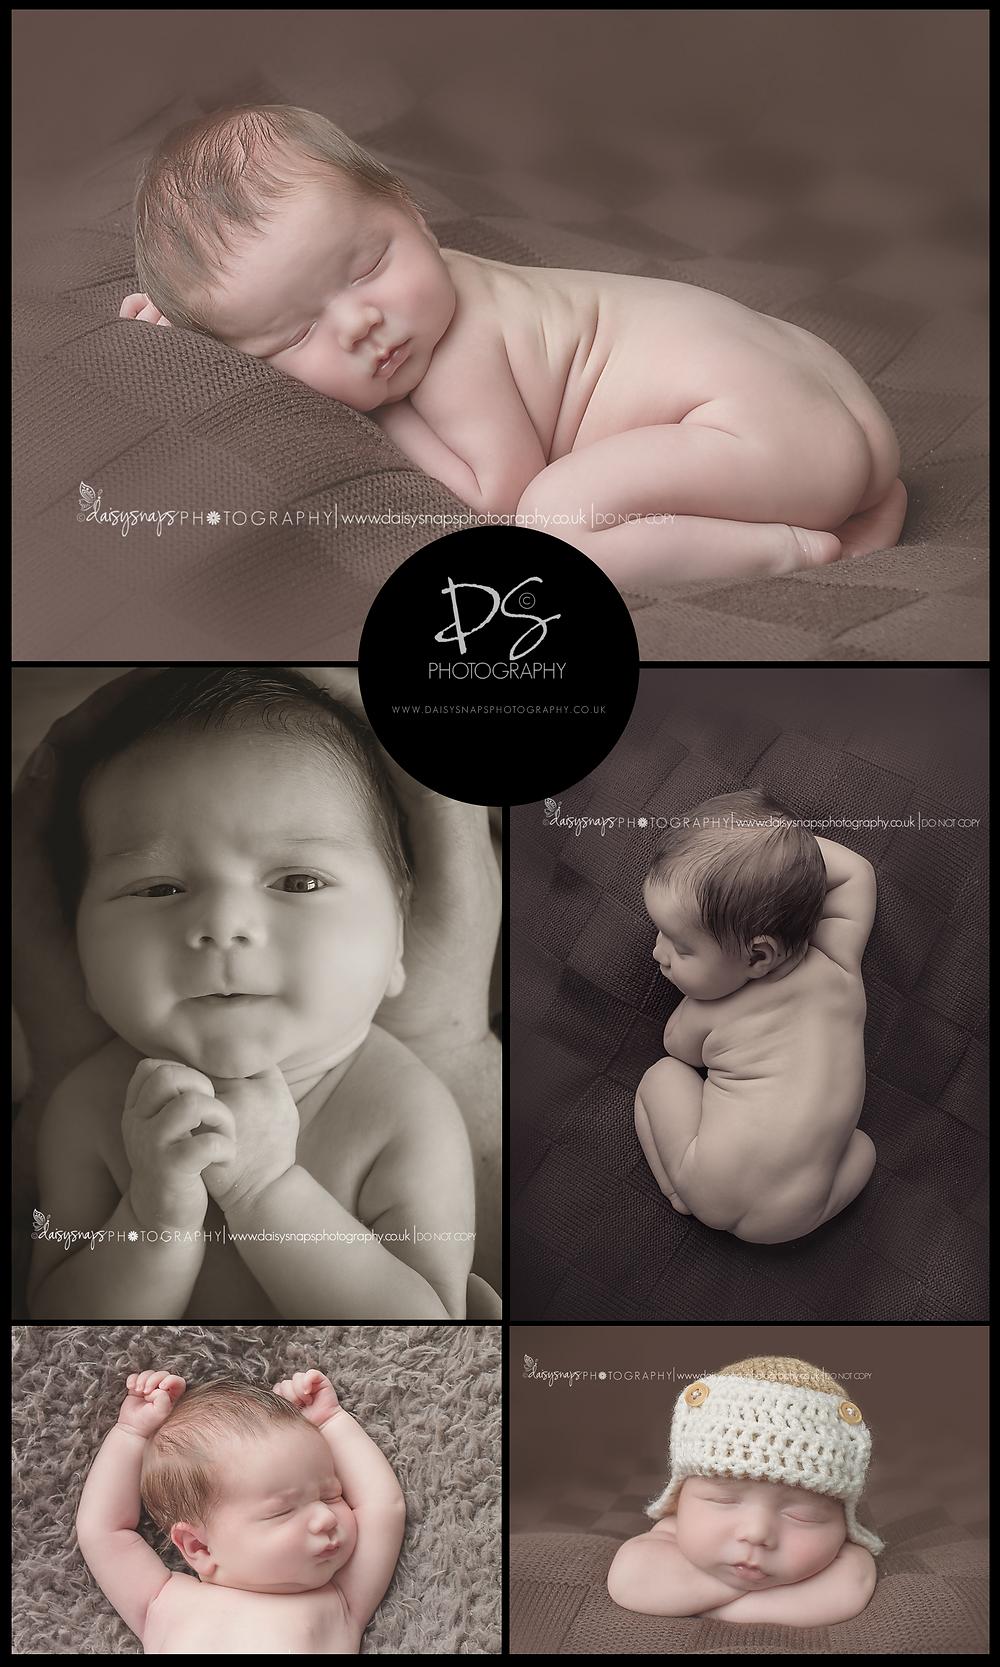 newborn photography london, london photographers, london newborn photographers, baby photos, newborn shoot london, newborn photography, baby photos london